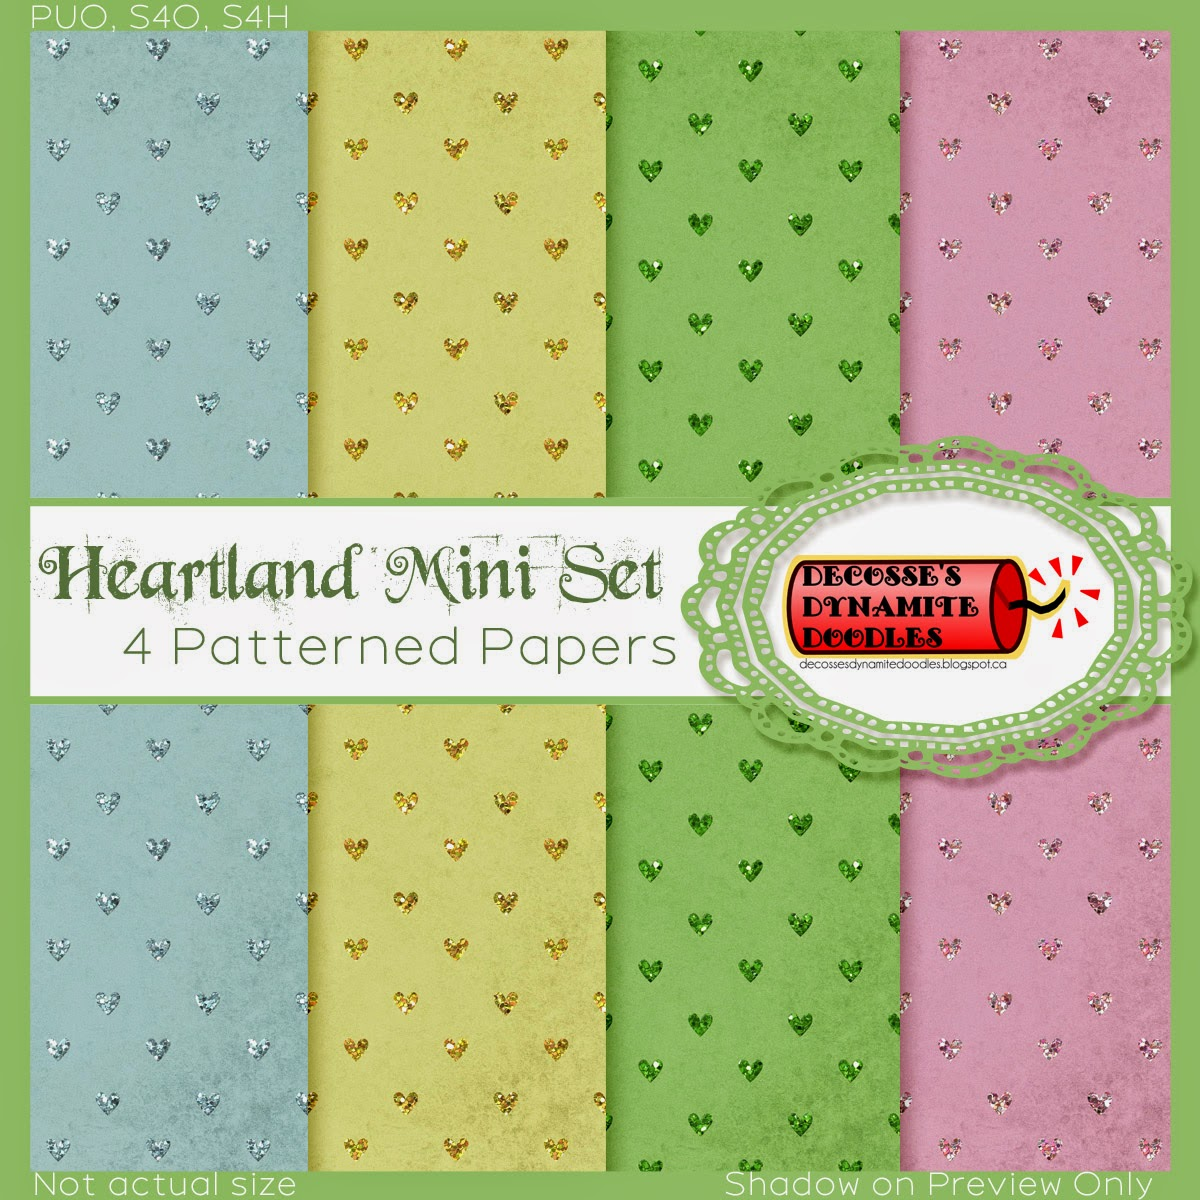 http://buyscribblesdesigns.blogspot.com/2015/02/ddd-heartland-mini-kit.html